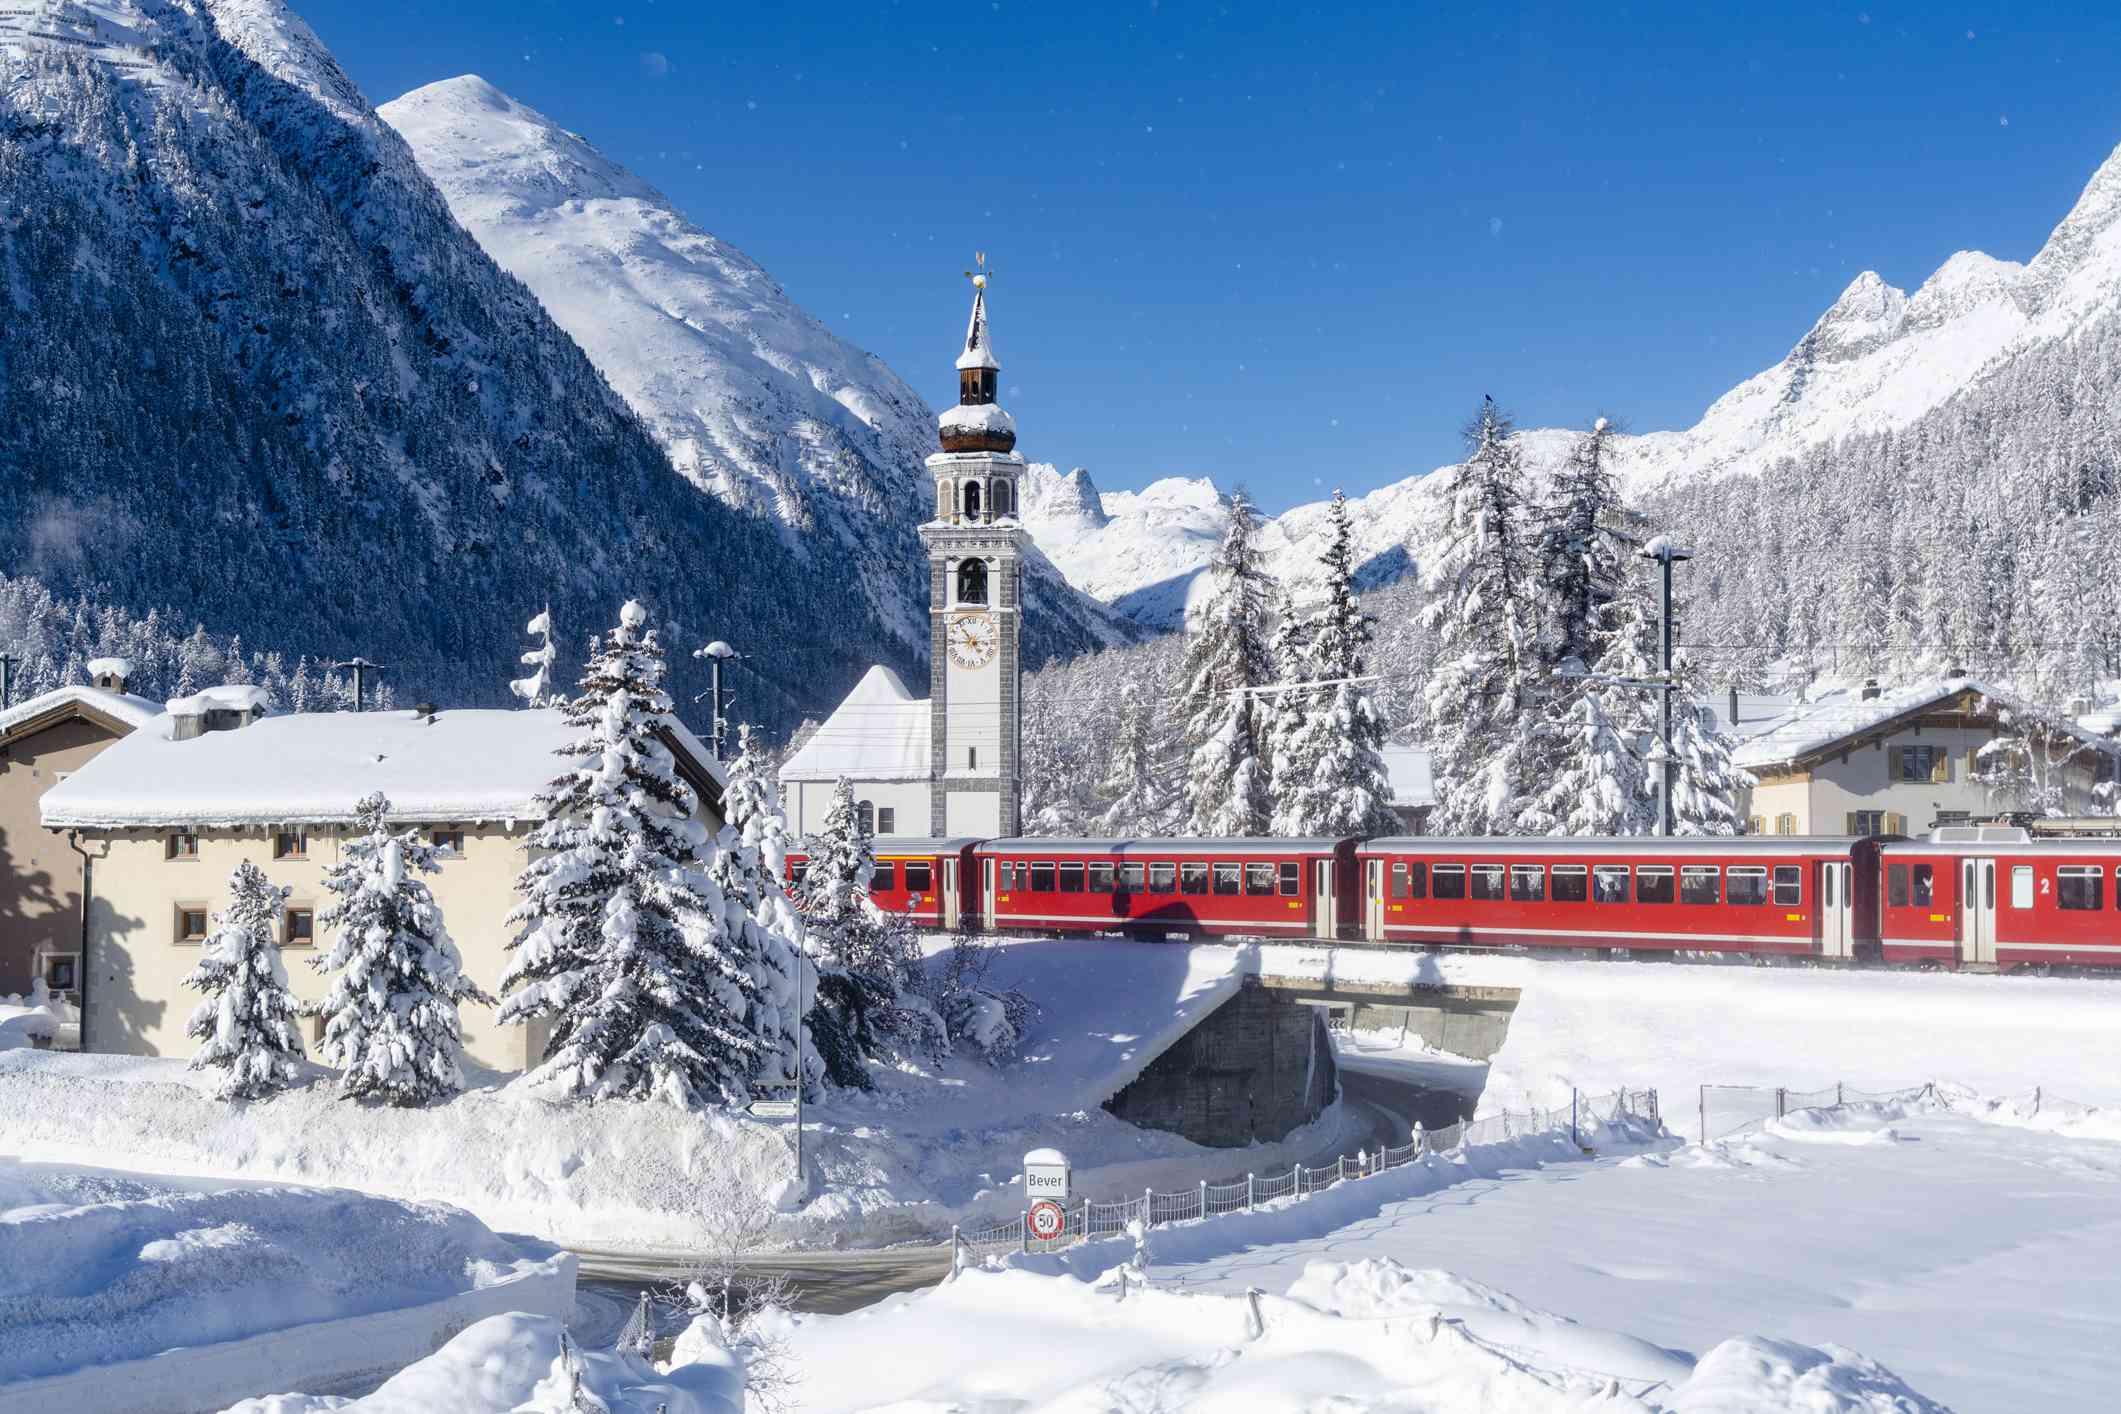 Bernina Express train along the snow capped village, Switzerland